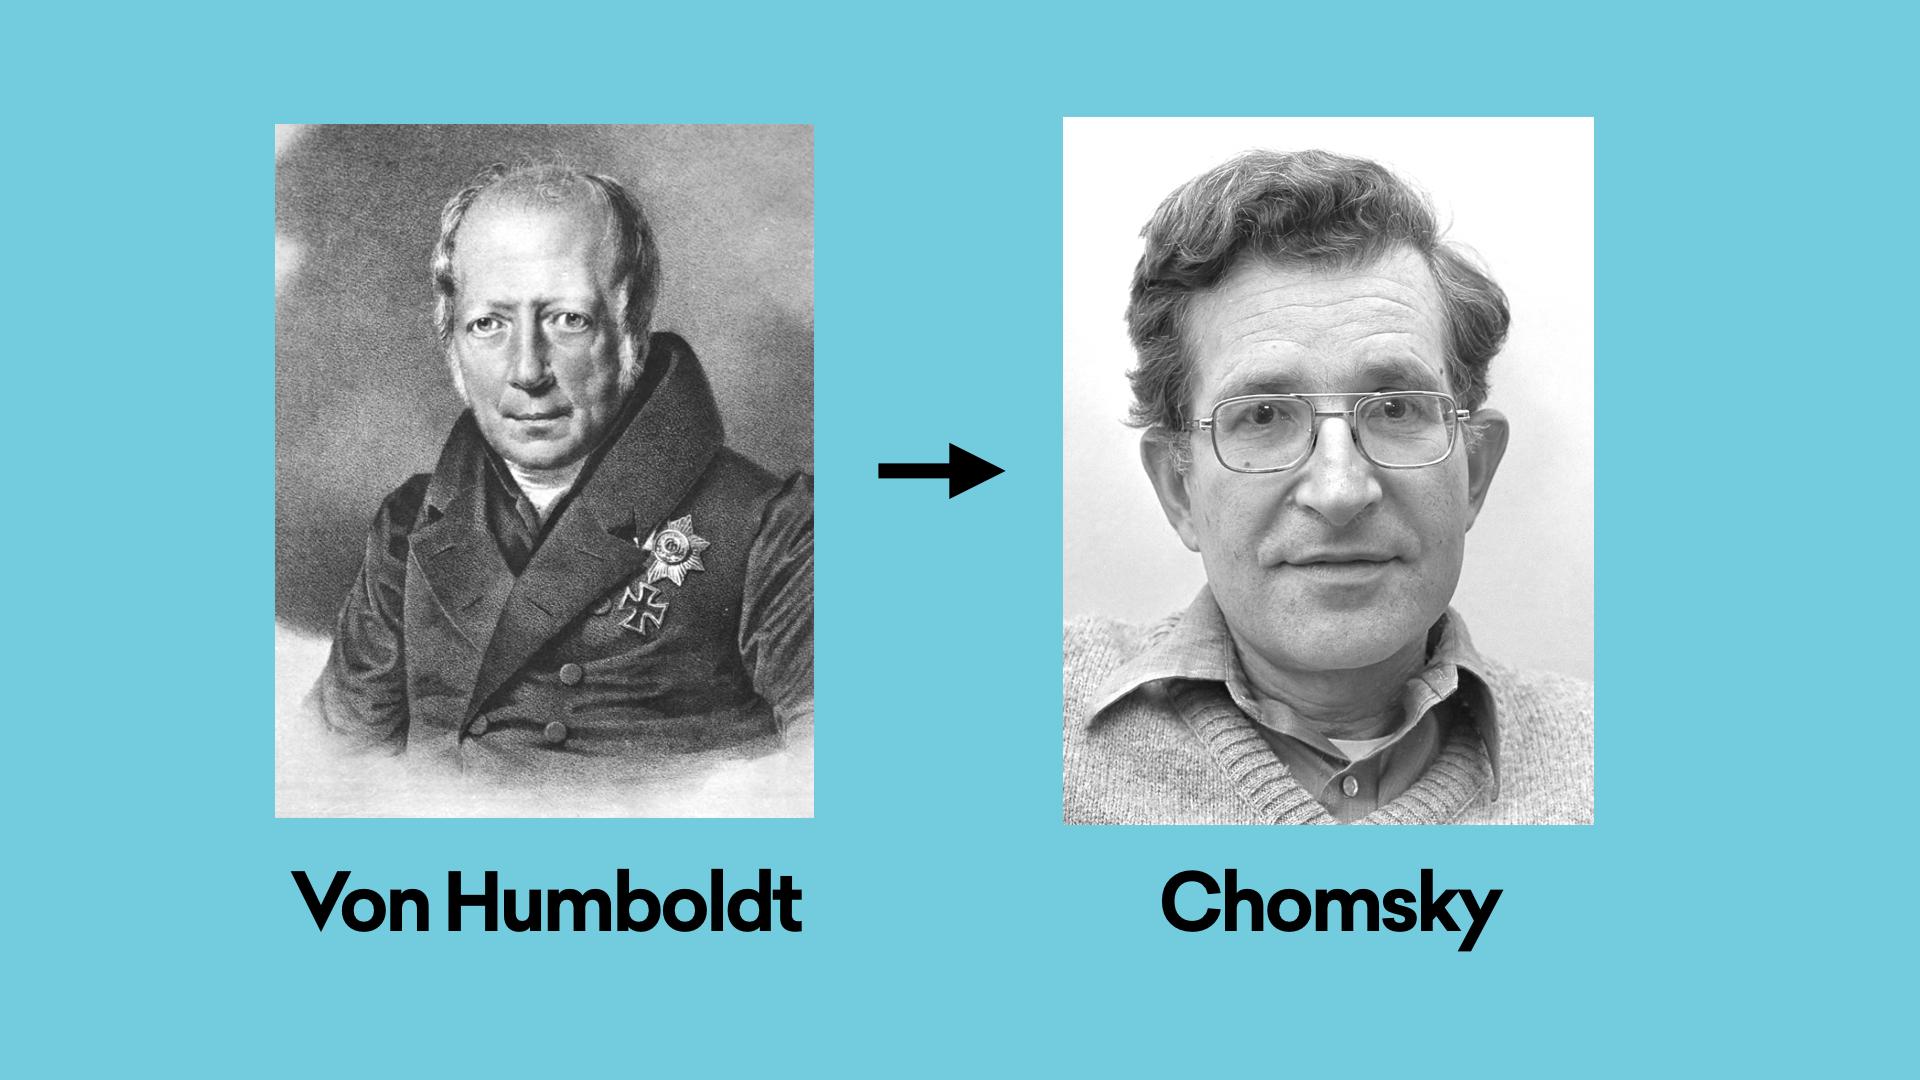 humboldt-chomsky-001